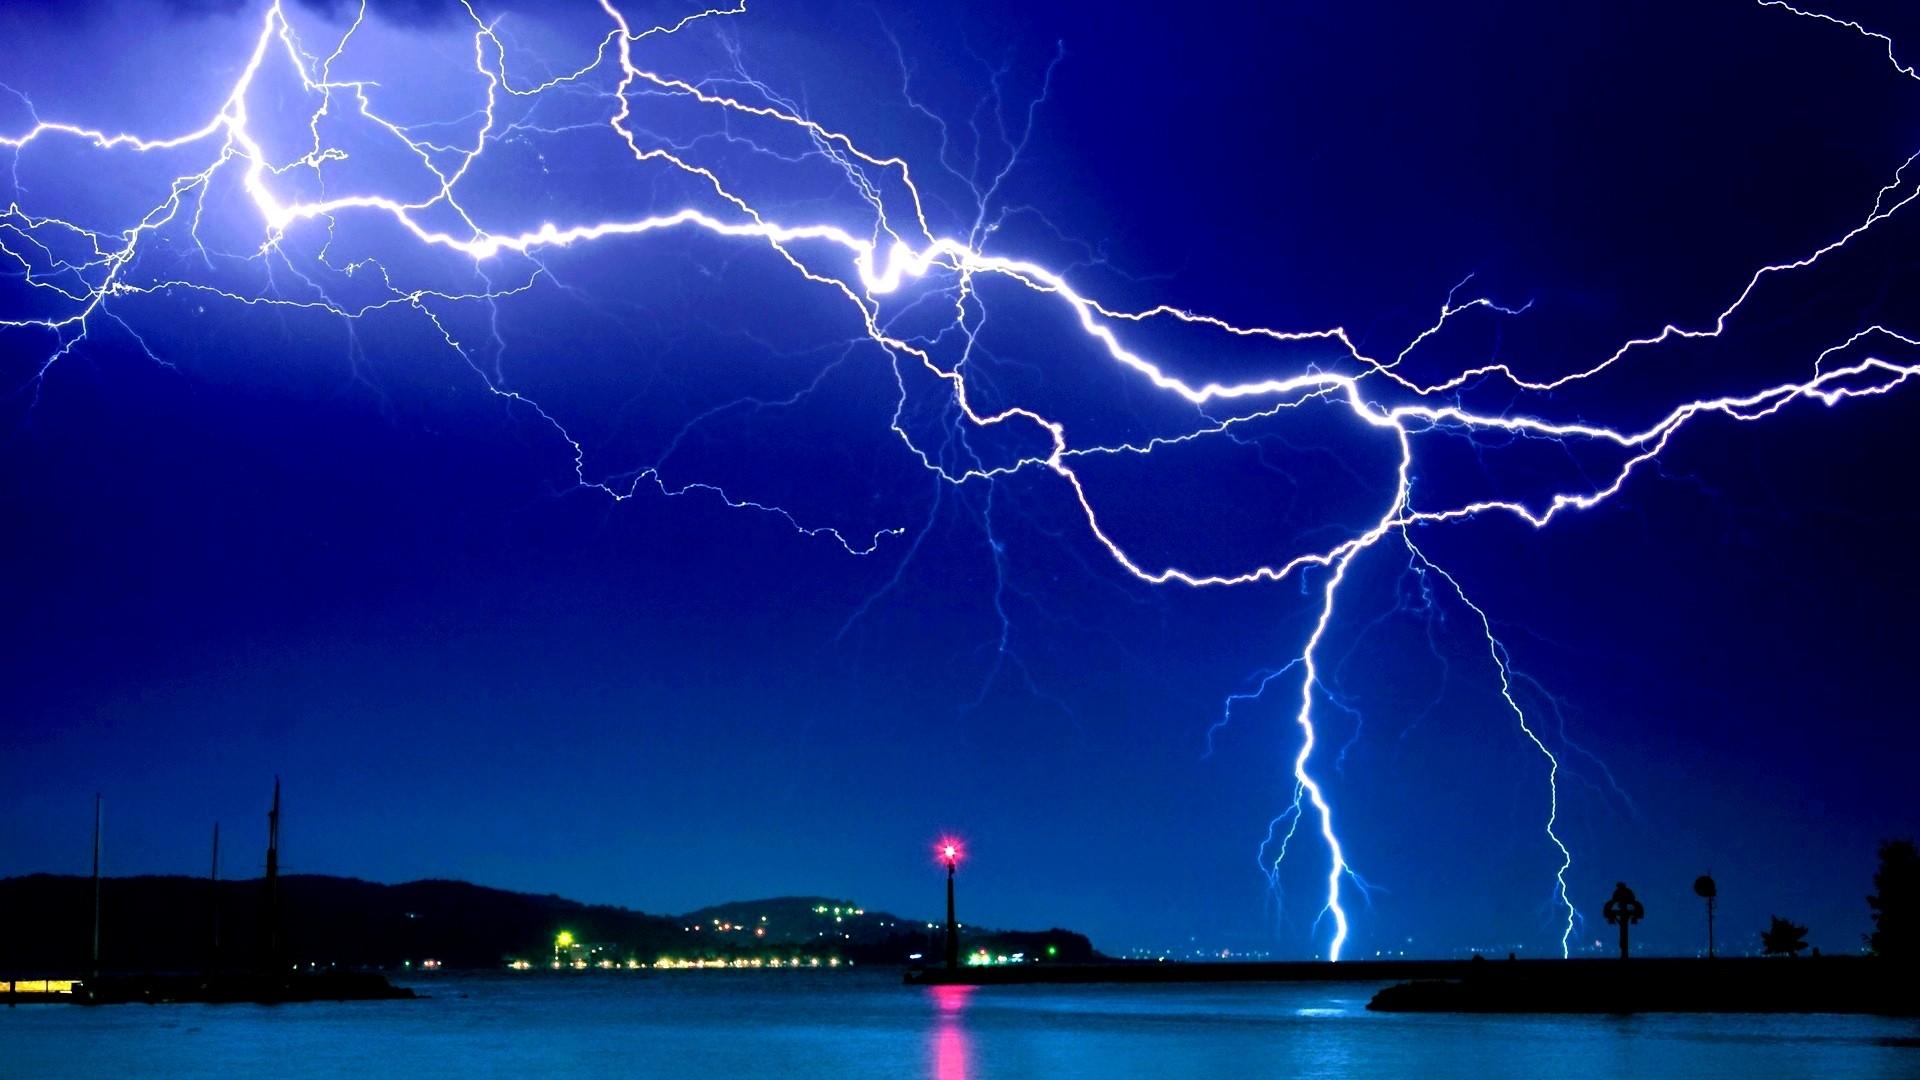 Lightning Wallpaper Picture hd